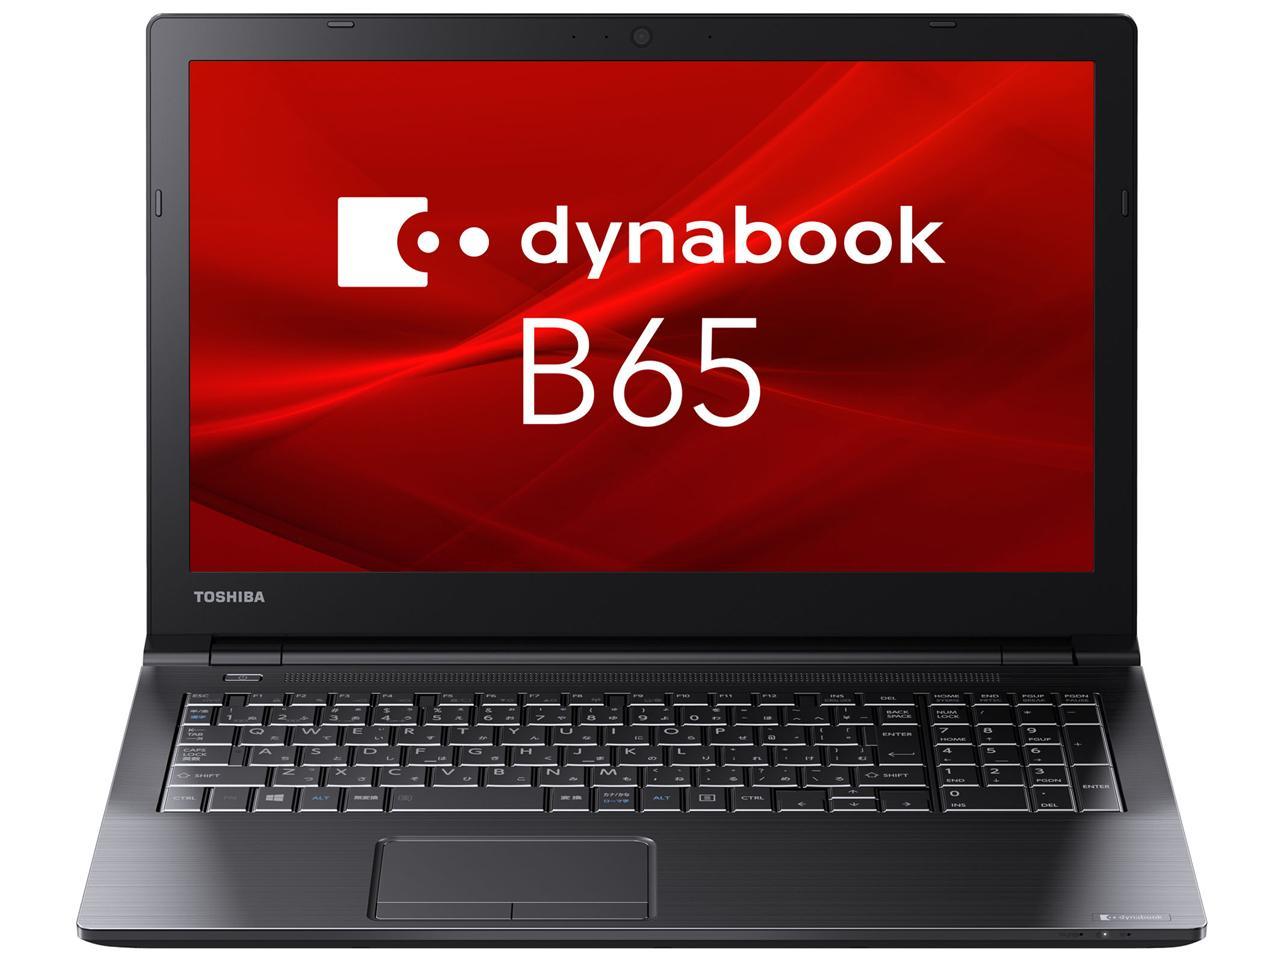 TOSHIBA dynabook B65/DN:Core i3-8130U、8GB、500GB HDD、15.6型HD、SMulti、WLAN+BT、テンキーあり、Win10 Pro 64 bit、Office無(PB6DNYB41R7FD1)【smtb-s】